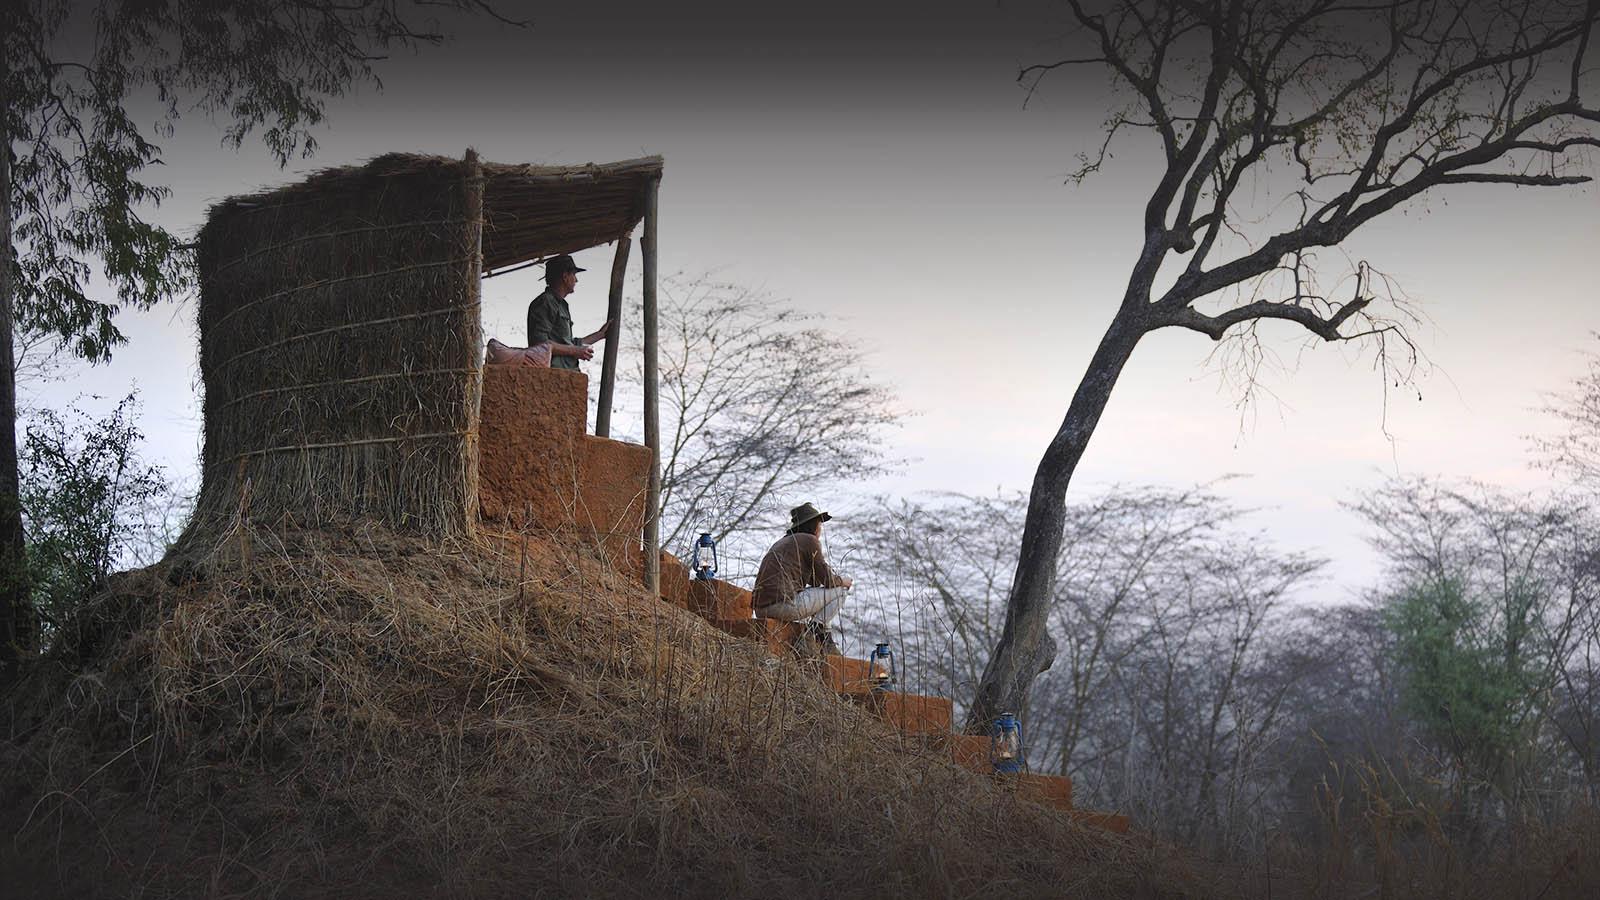 mwamba-bush-camp-lodge-zambia-in-style-safari-packages-south-luangwa-national-park-hide